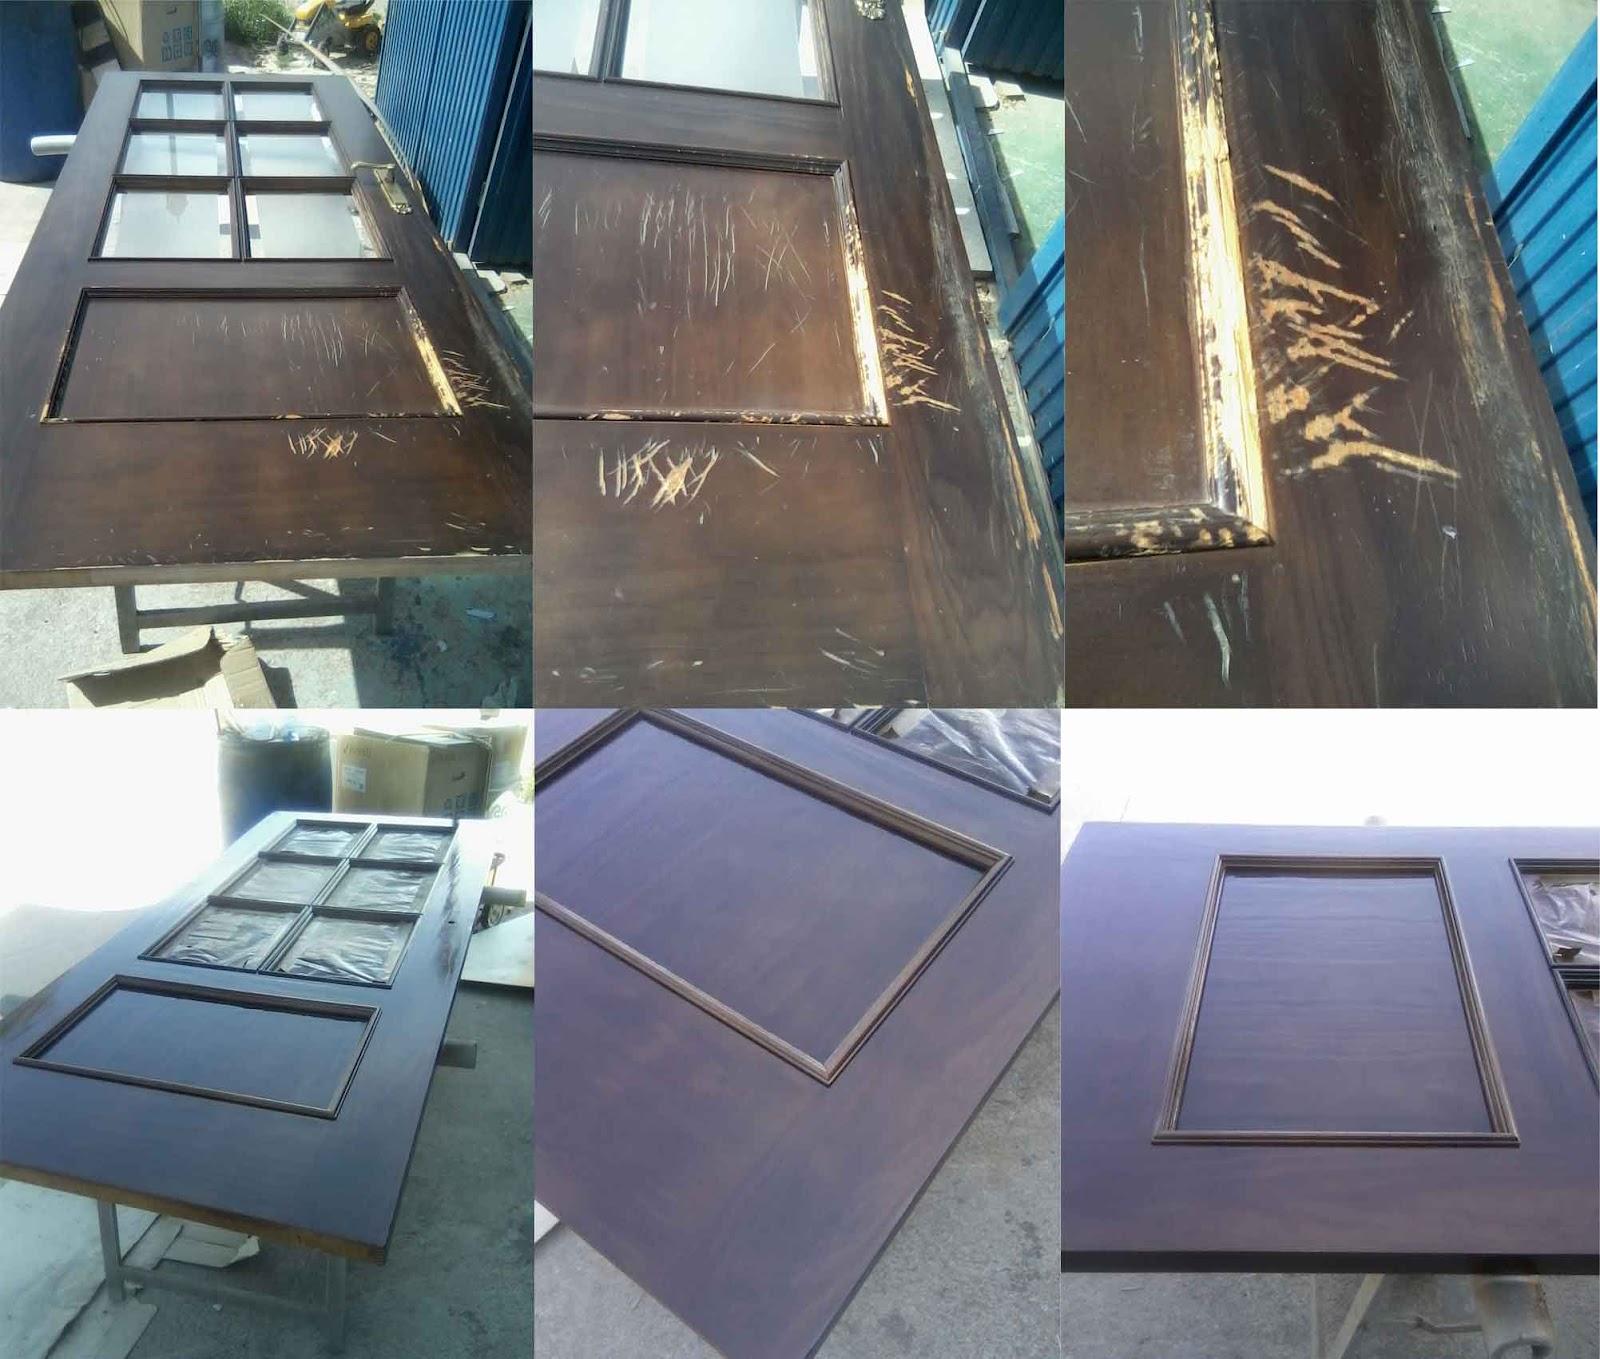 Manuel j padilla arte restauracion for Restaurar puertas de madera interior